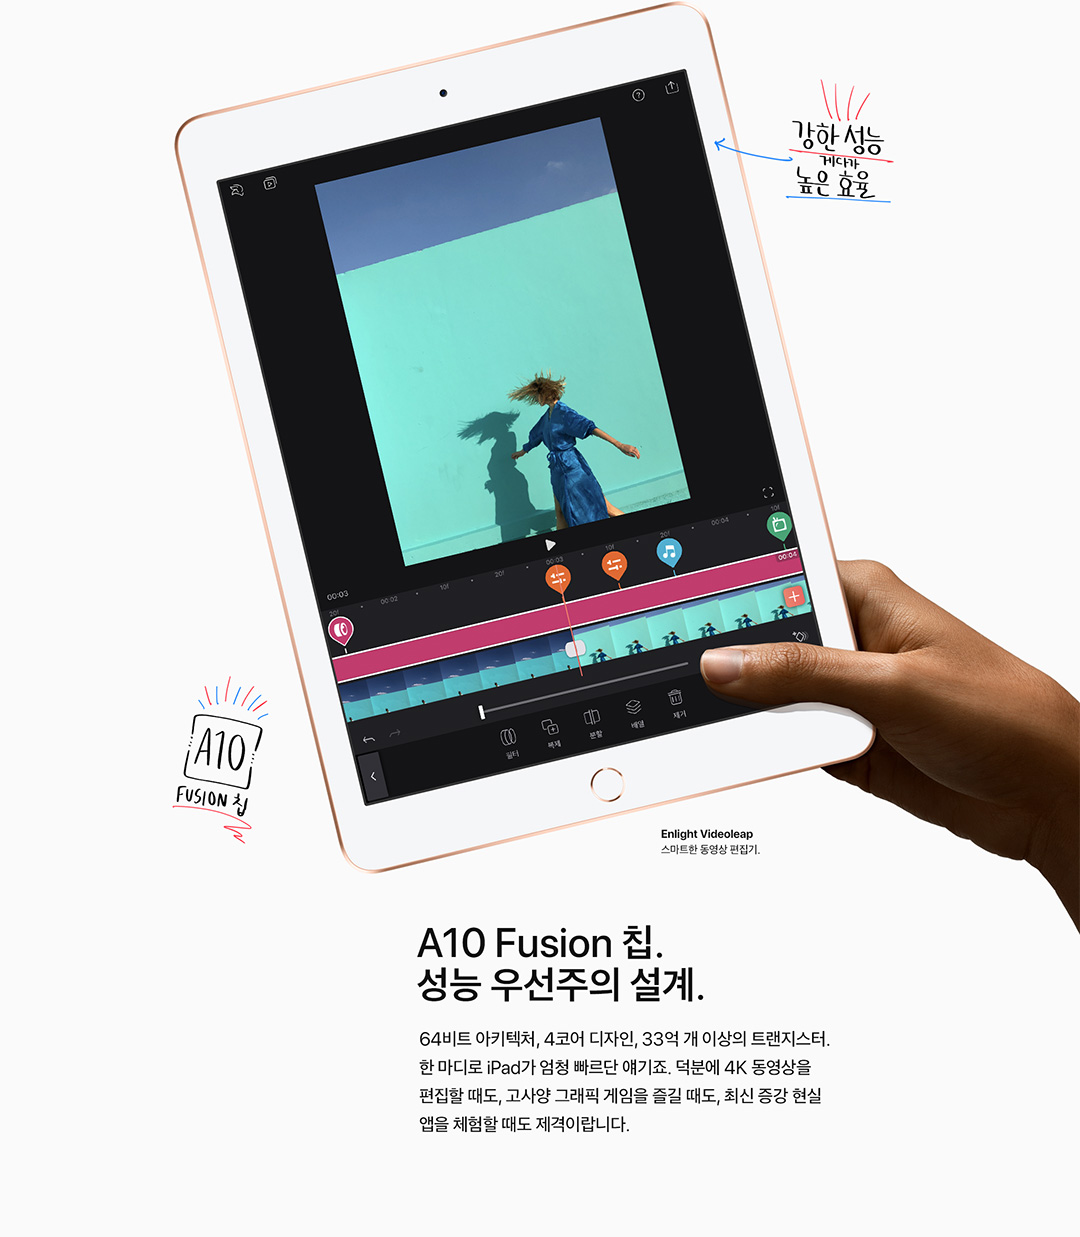 A10 Fusion 칩. 성능 우선주의 설계. 64비트 아키텍처, 4코어 디자인, 33억 개 이상의 트랜지스터. 한 마디로 iPad가 엄청 빠르단 얘기죠. 덕분에 4K 동영상을 편집할 때도, 고사양 그래픽 게임을 즐길 때도, 최신 증강 현실 앱을 체험할 때도 제격이랍니다.